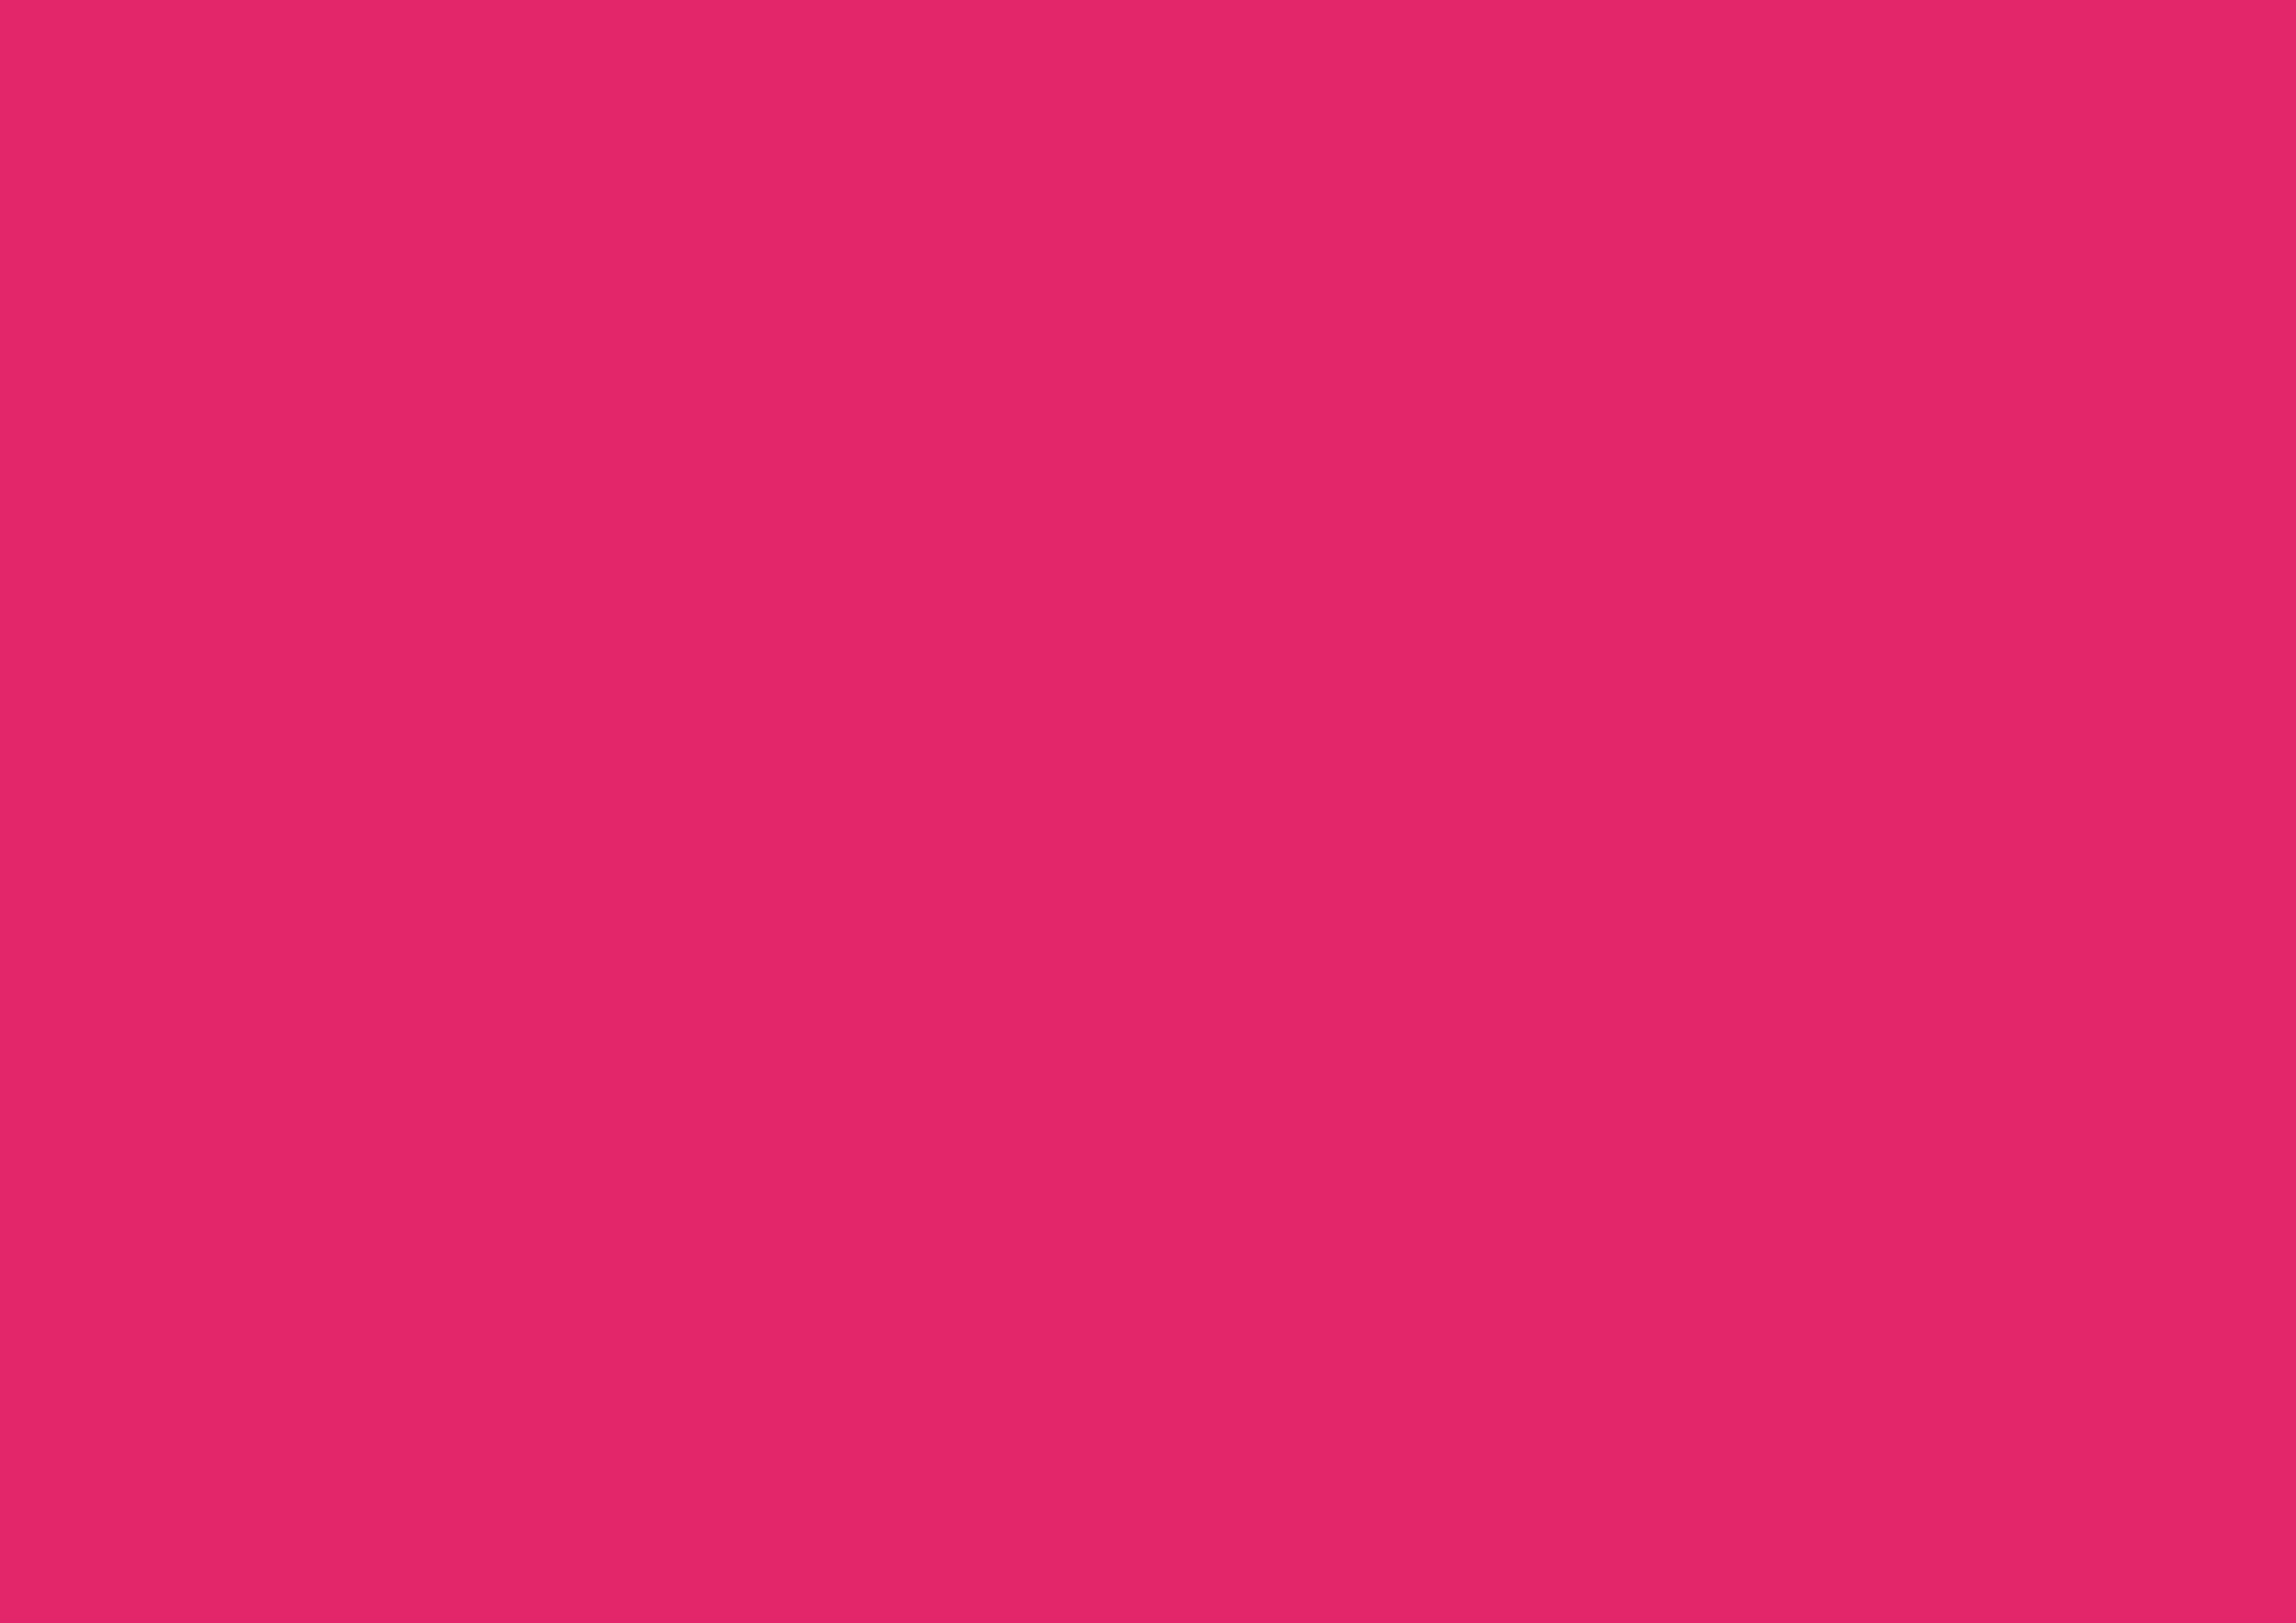 3508x2480 Razzmatazz Solid Color Background